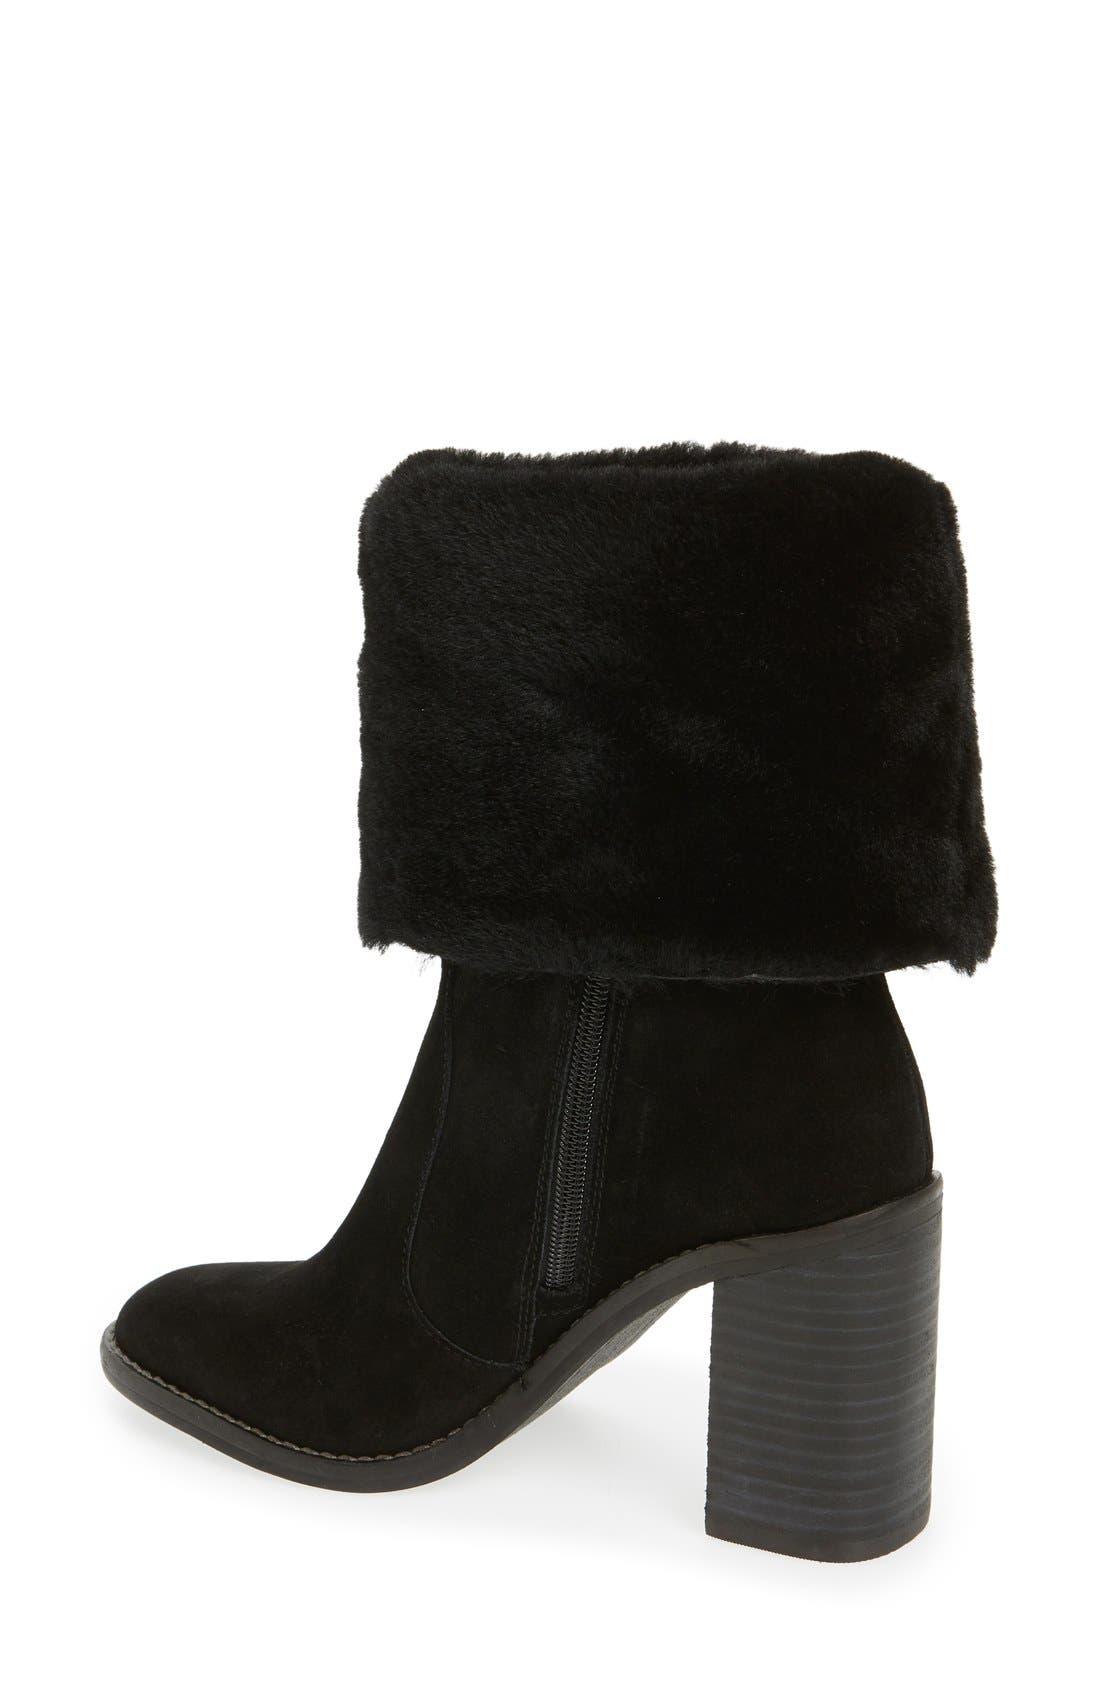 'Maira' Genuine Shearling Cuff Boot,                             Alternate thumbnail 2, color,                             002